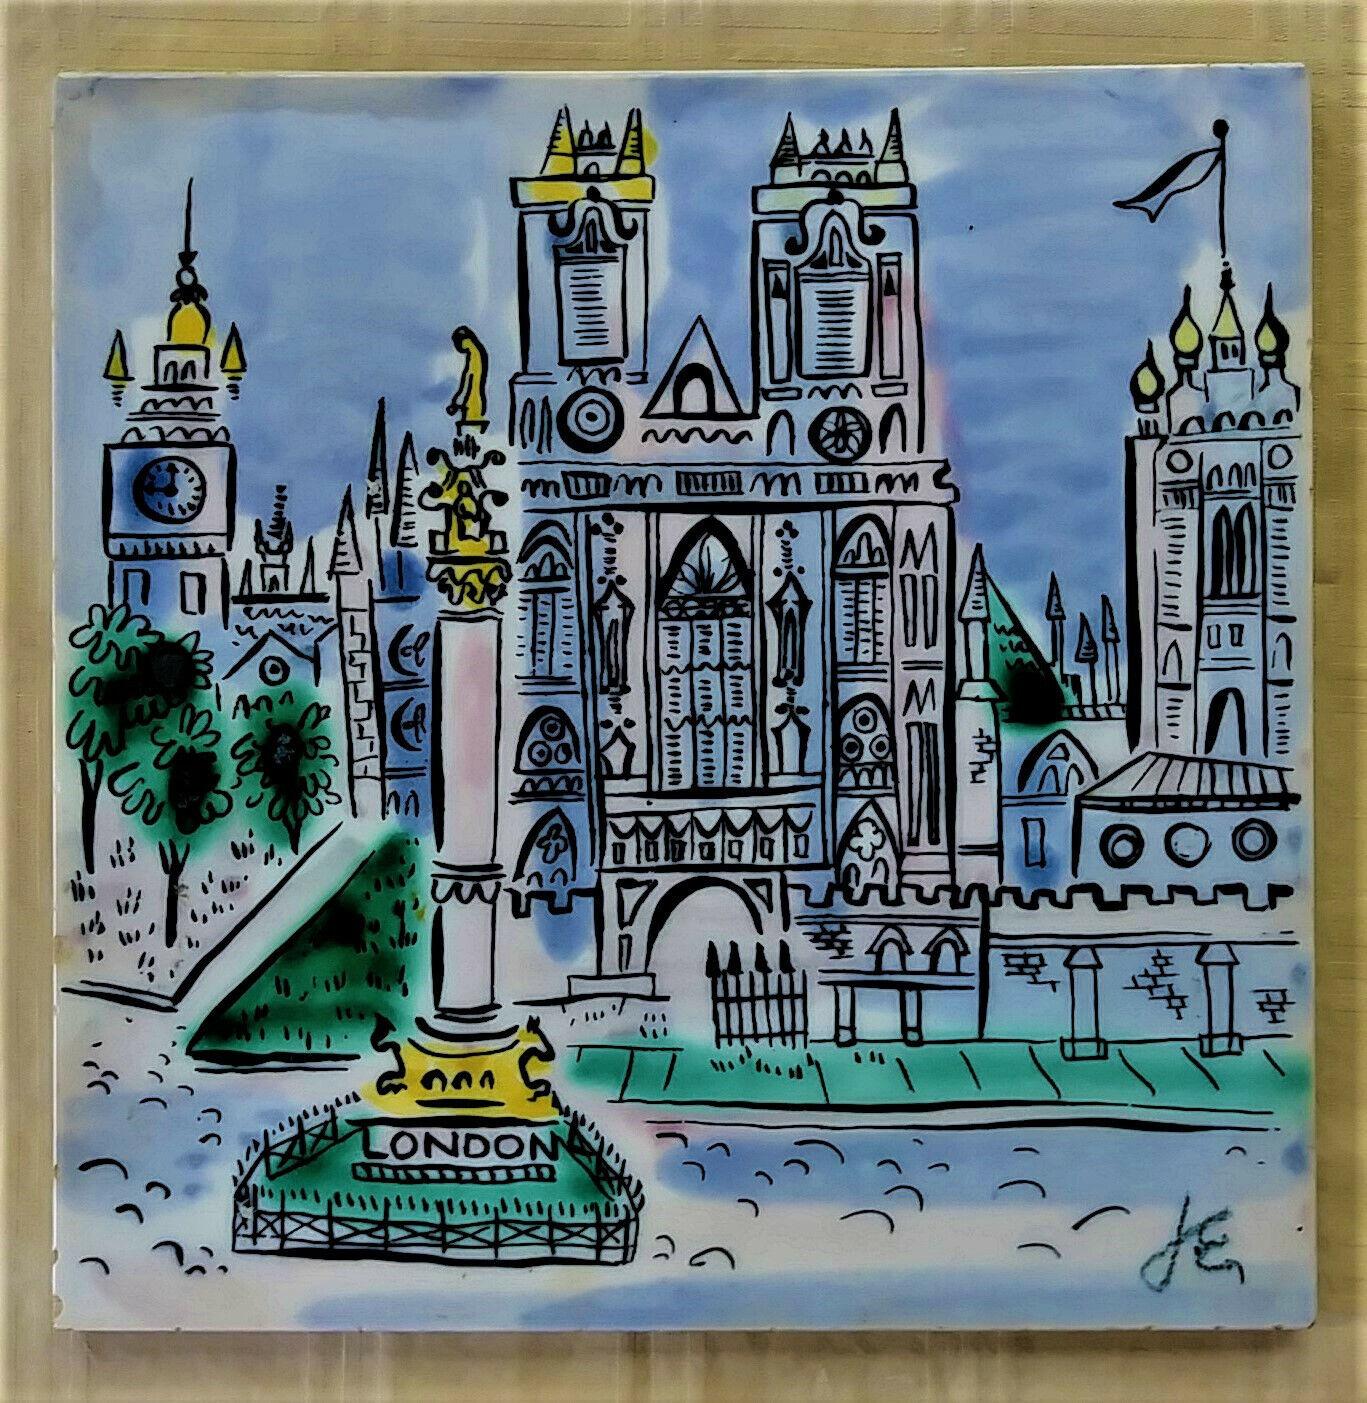 Vintage Wheeling Ceramic Tile Hand Painted London Scene, Signed JE - $14.00